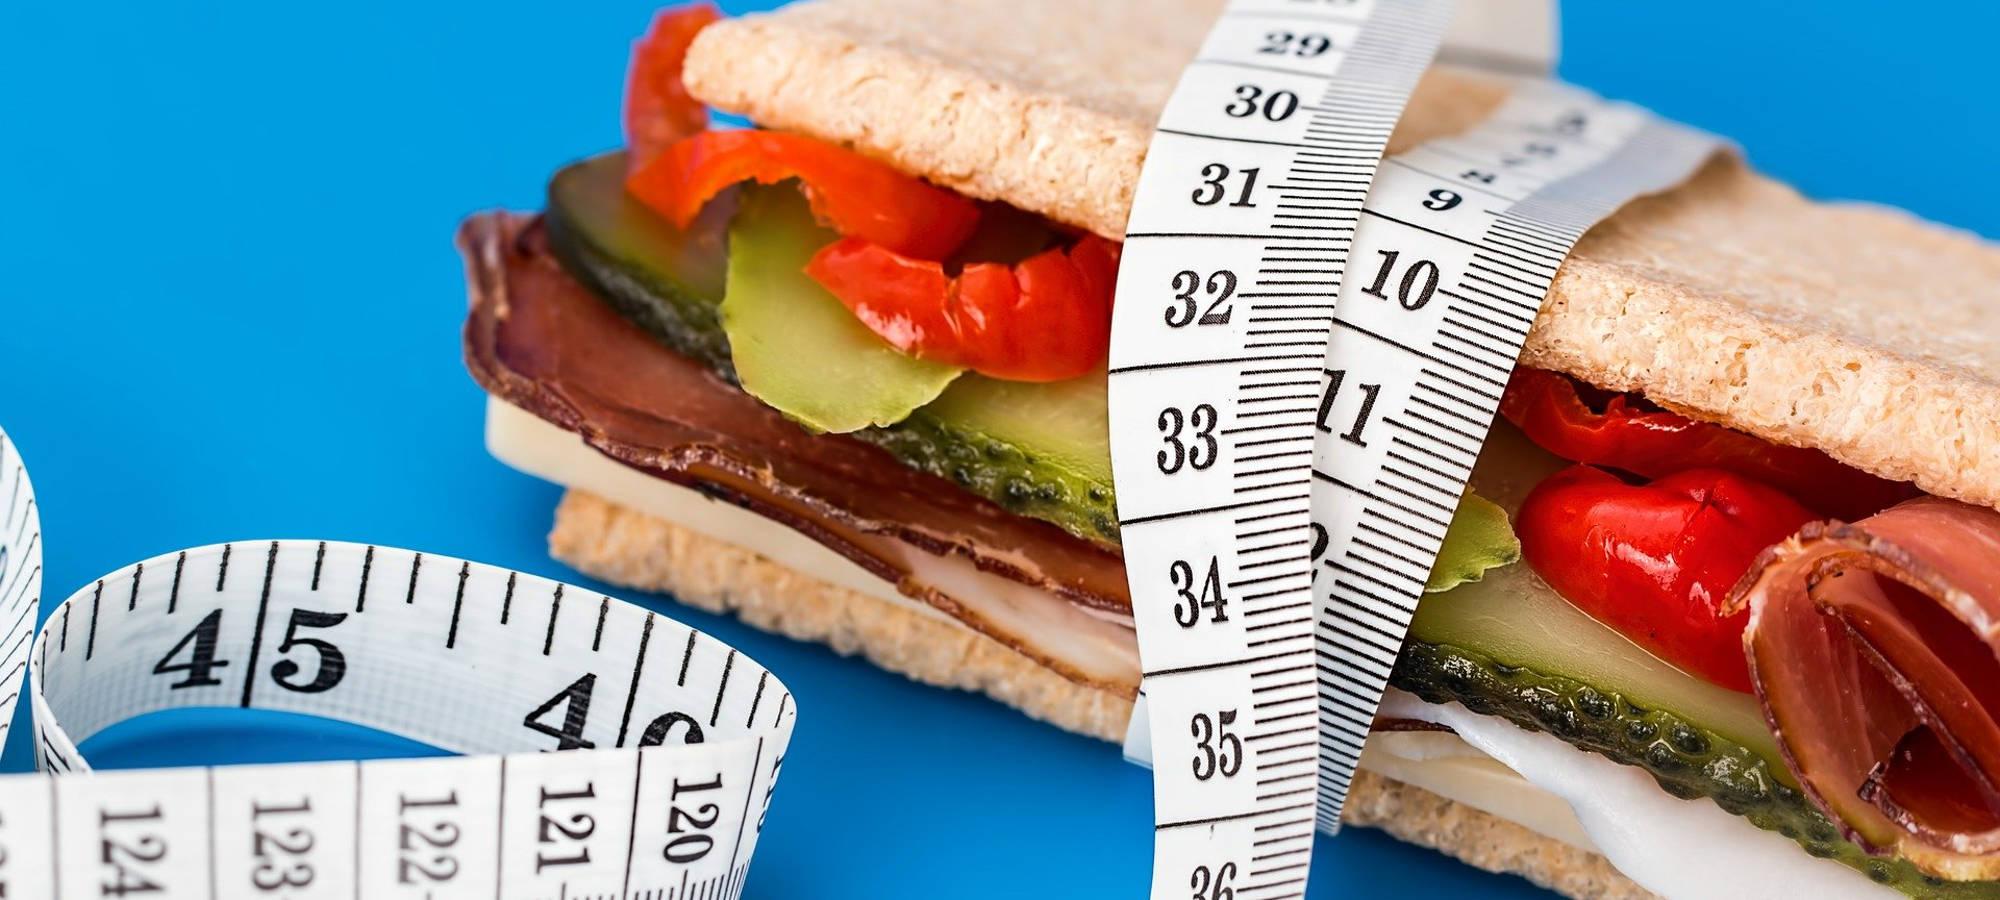 sandwich-mit-maßband